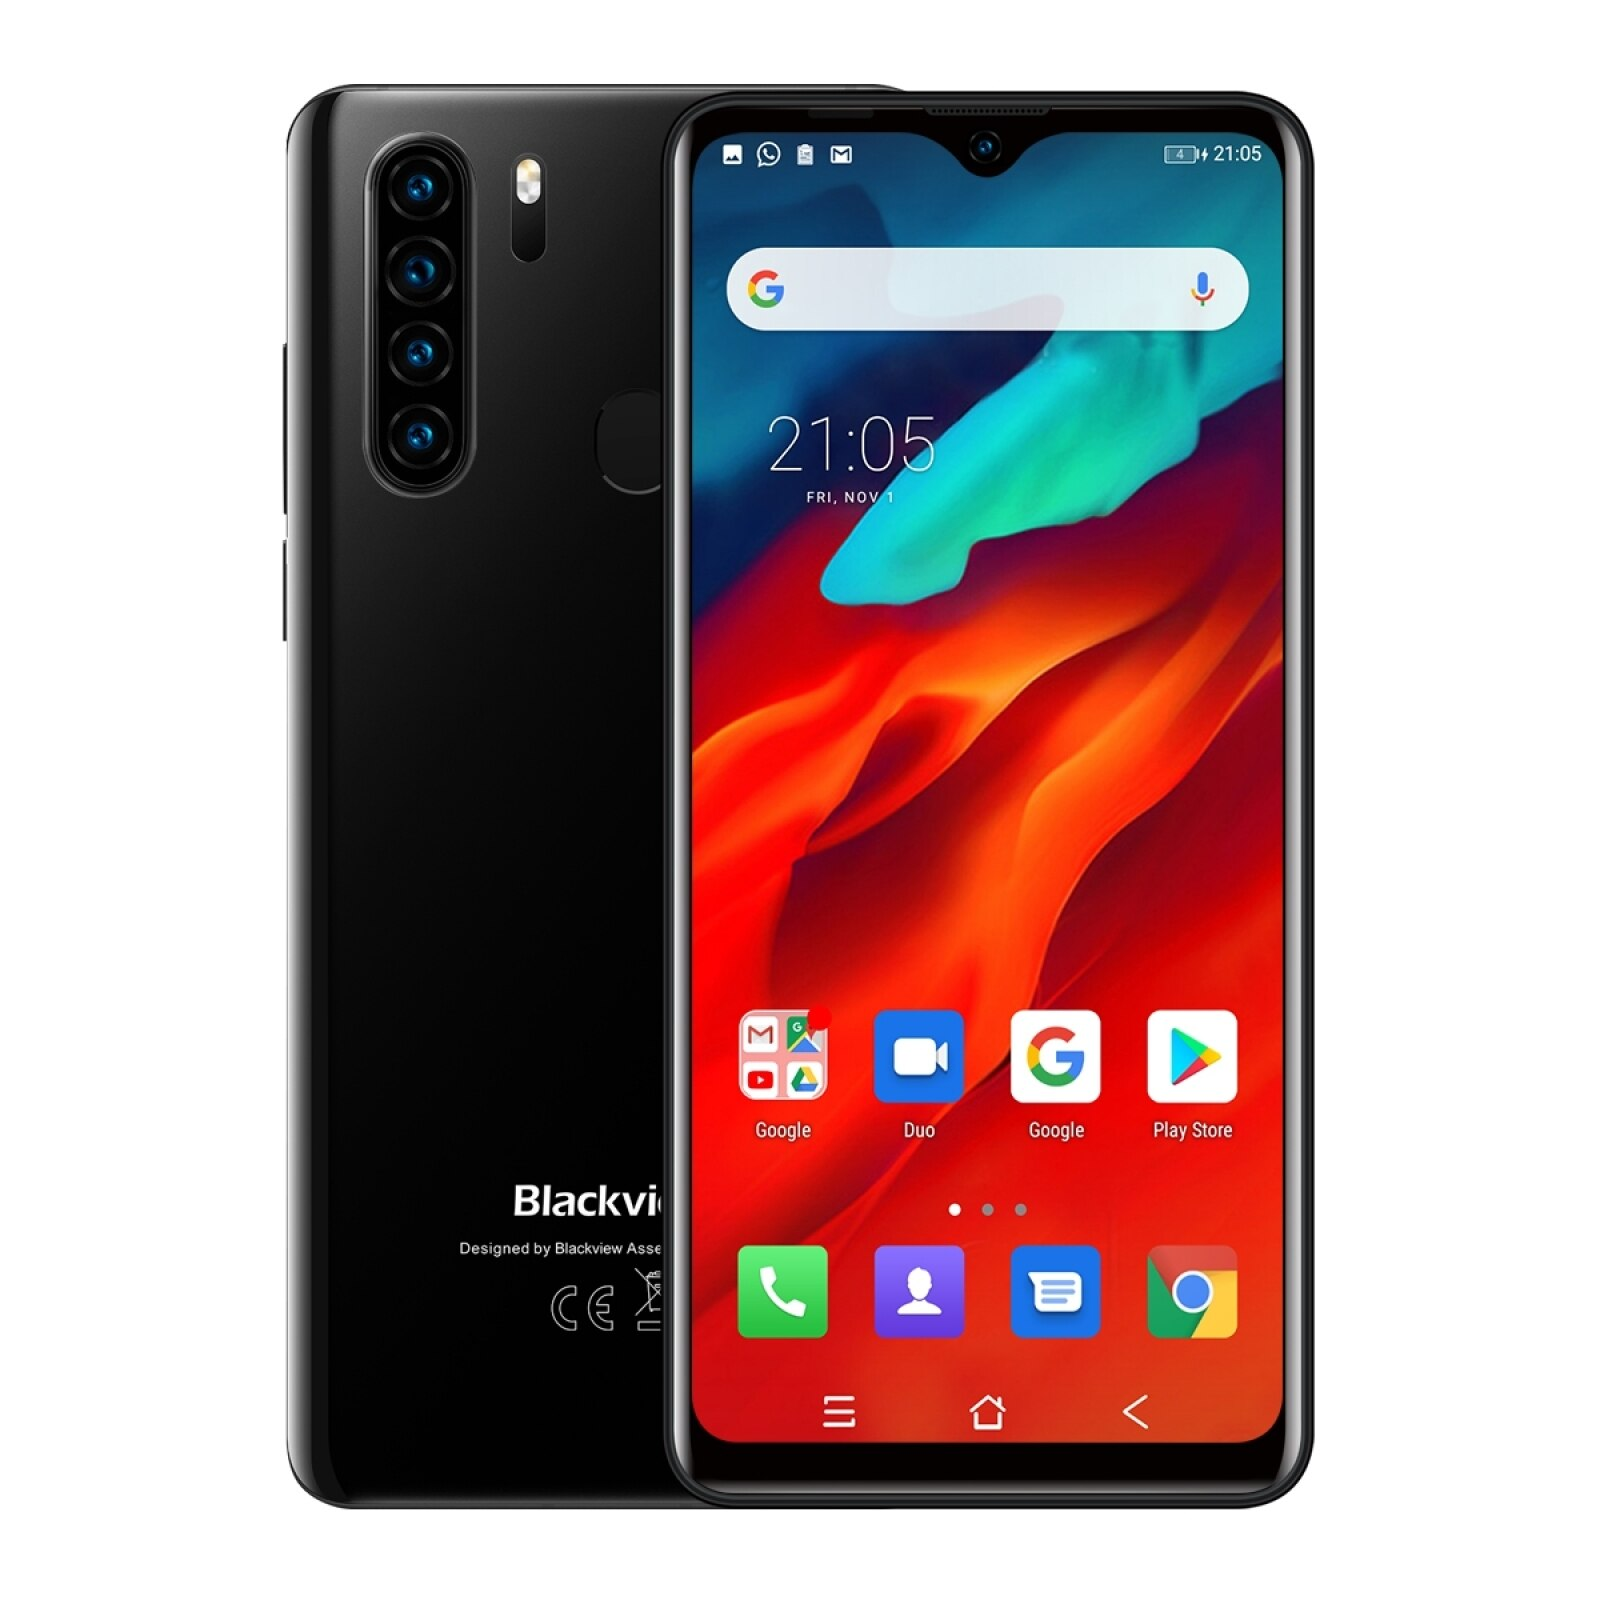 Blackview A80 Plus смартфон с восьмиядерным процессором, ОЗУ 4 Гб, ПЗУ 64 ГБ, 13 МП, Android 10